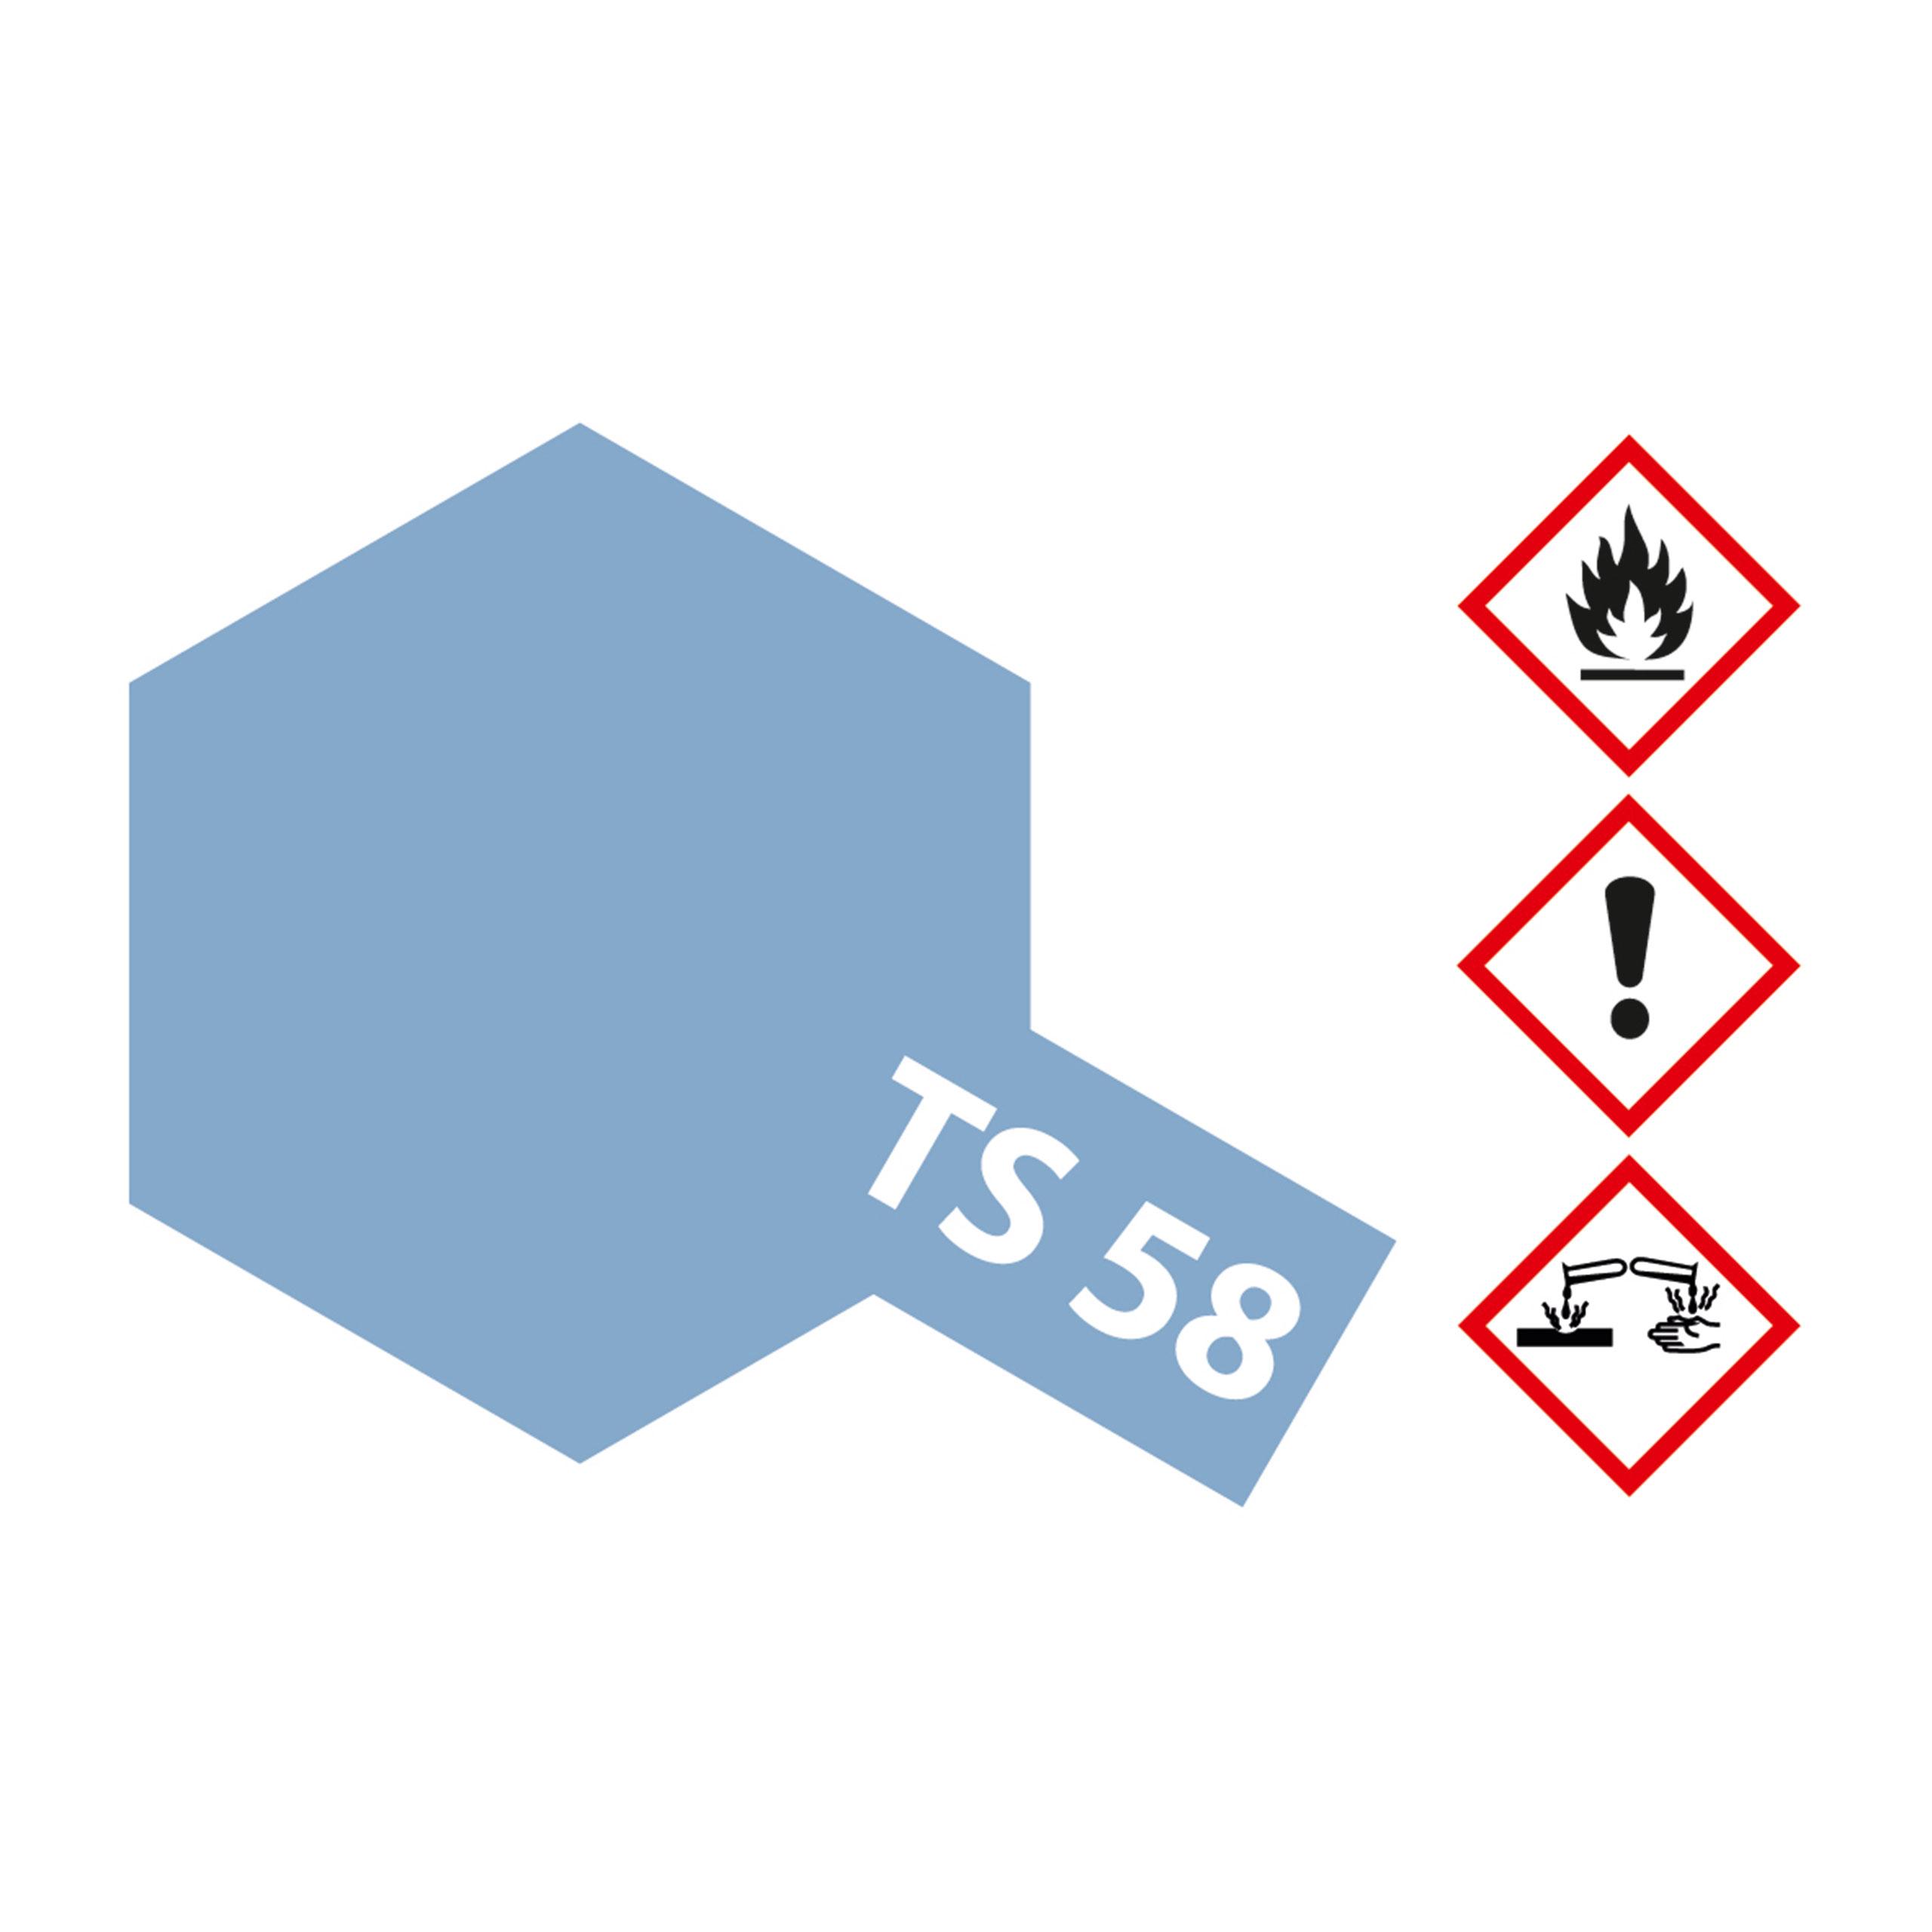 TS-58 Hellblau Perleffekt glaenzend - 100ml Sprayfarbe Kunstharz Tamiya 300085058